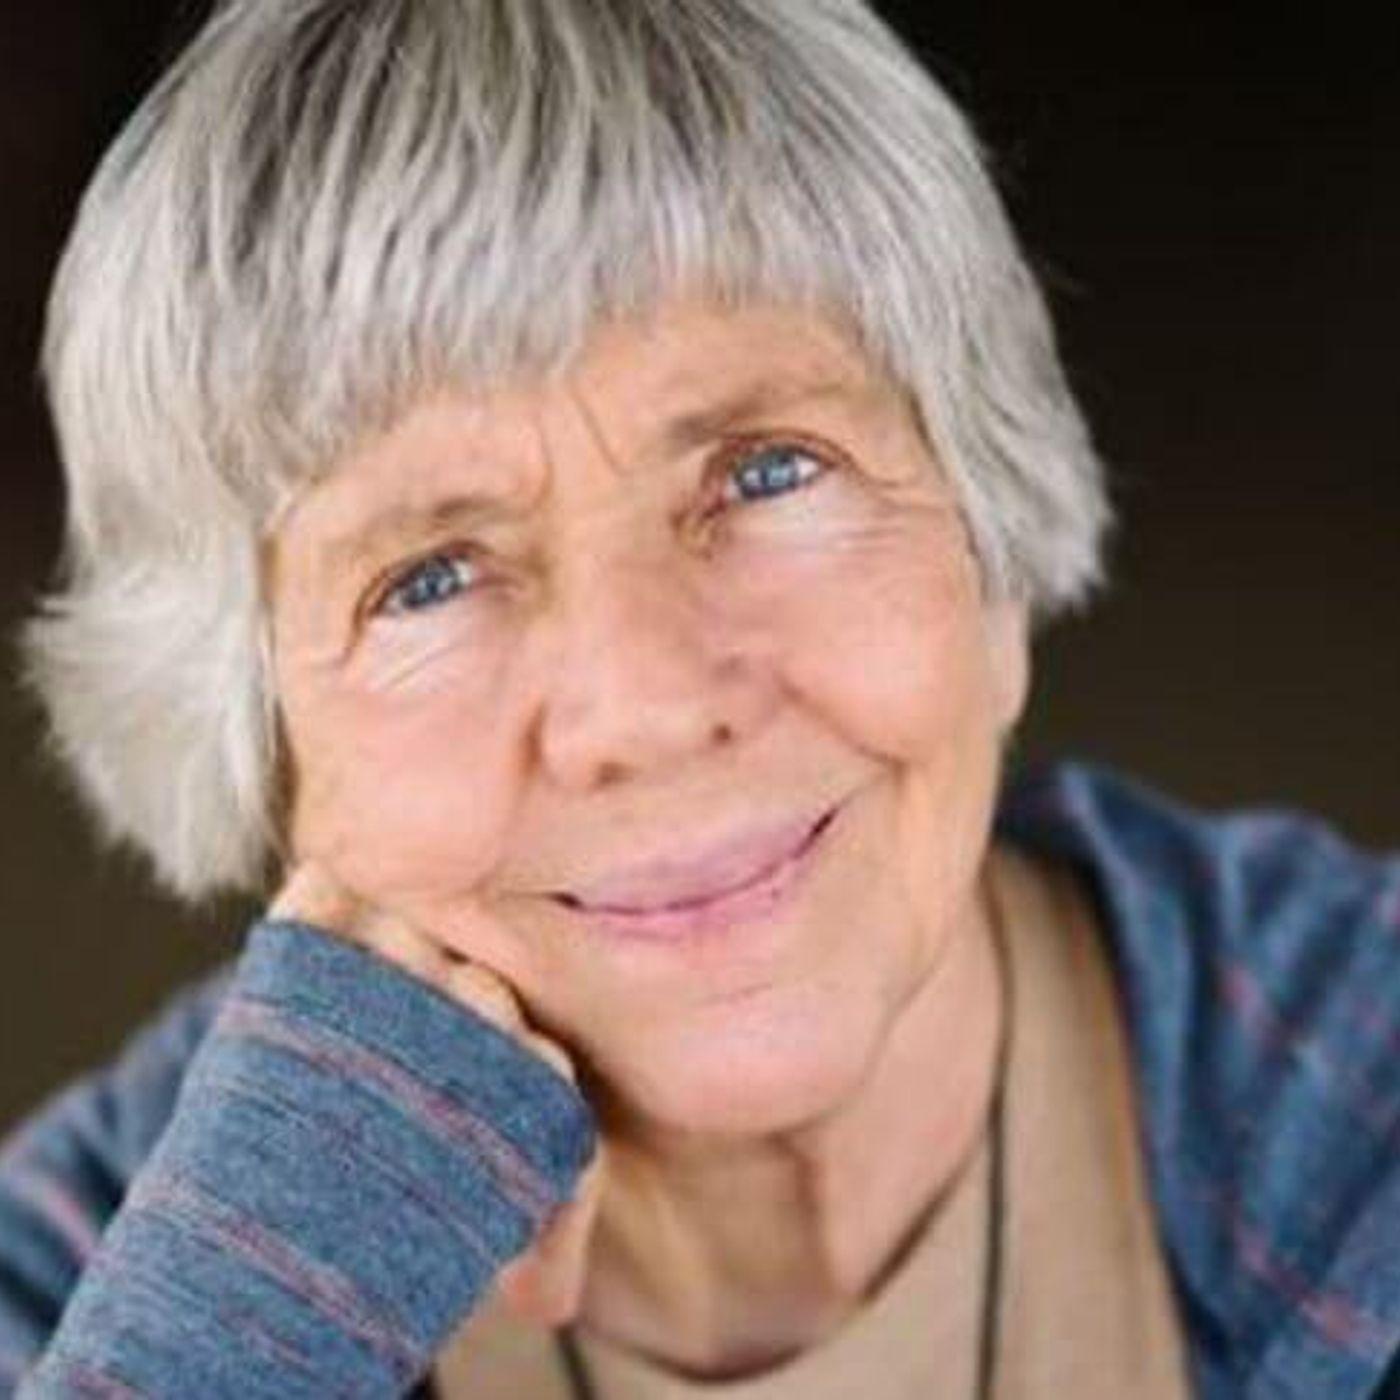 Episode 8: Women Age 50+ Are Flourishing, Not Diminishing—with Mary Pipher